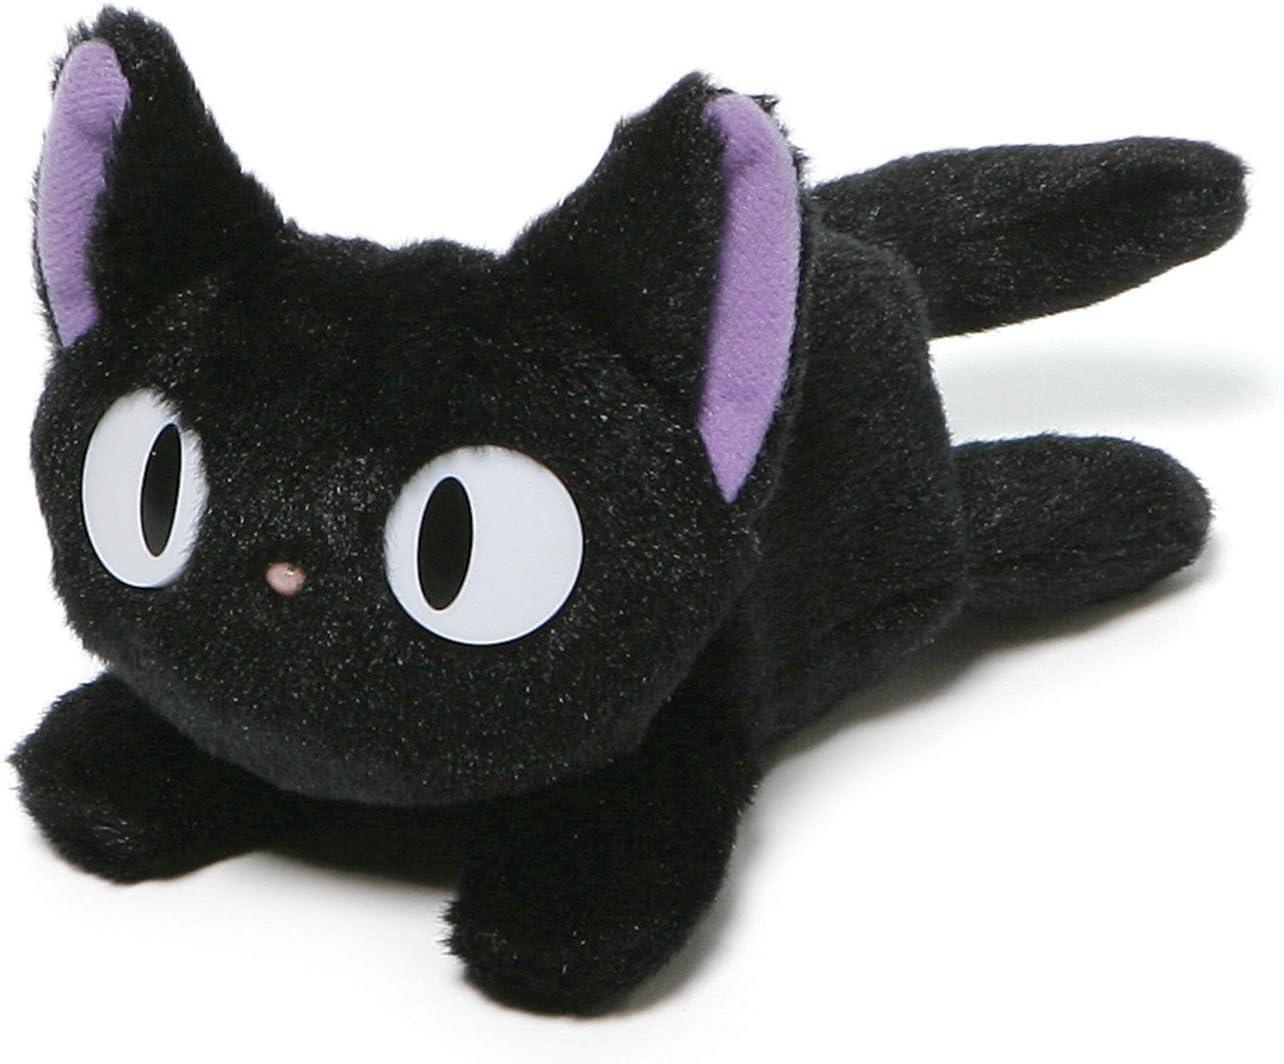 Amazon Com Gund Kikis Delivery Service Jiji Beanbag Cat Stuffed Animal Plush 6 5 Toys Games